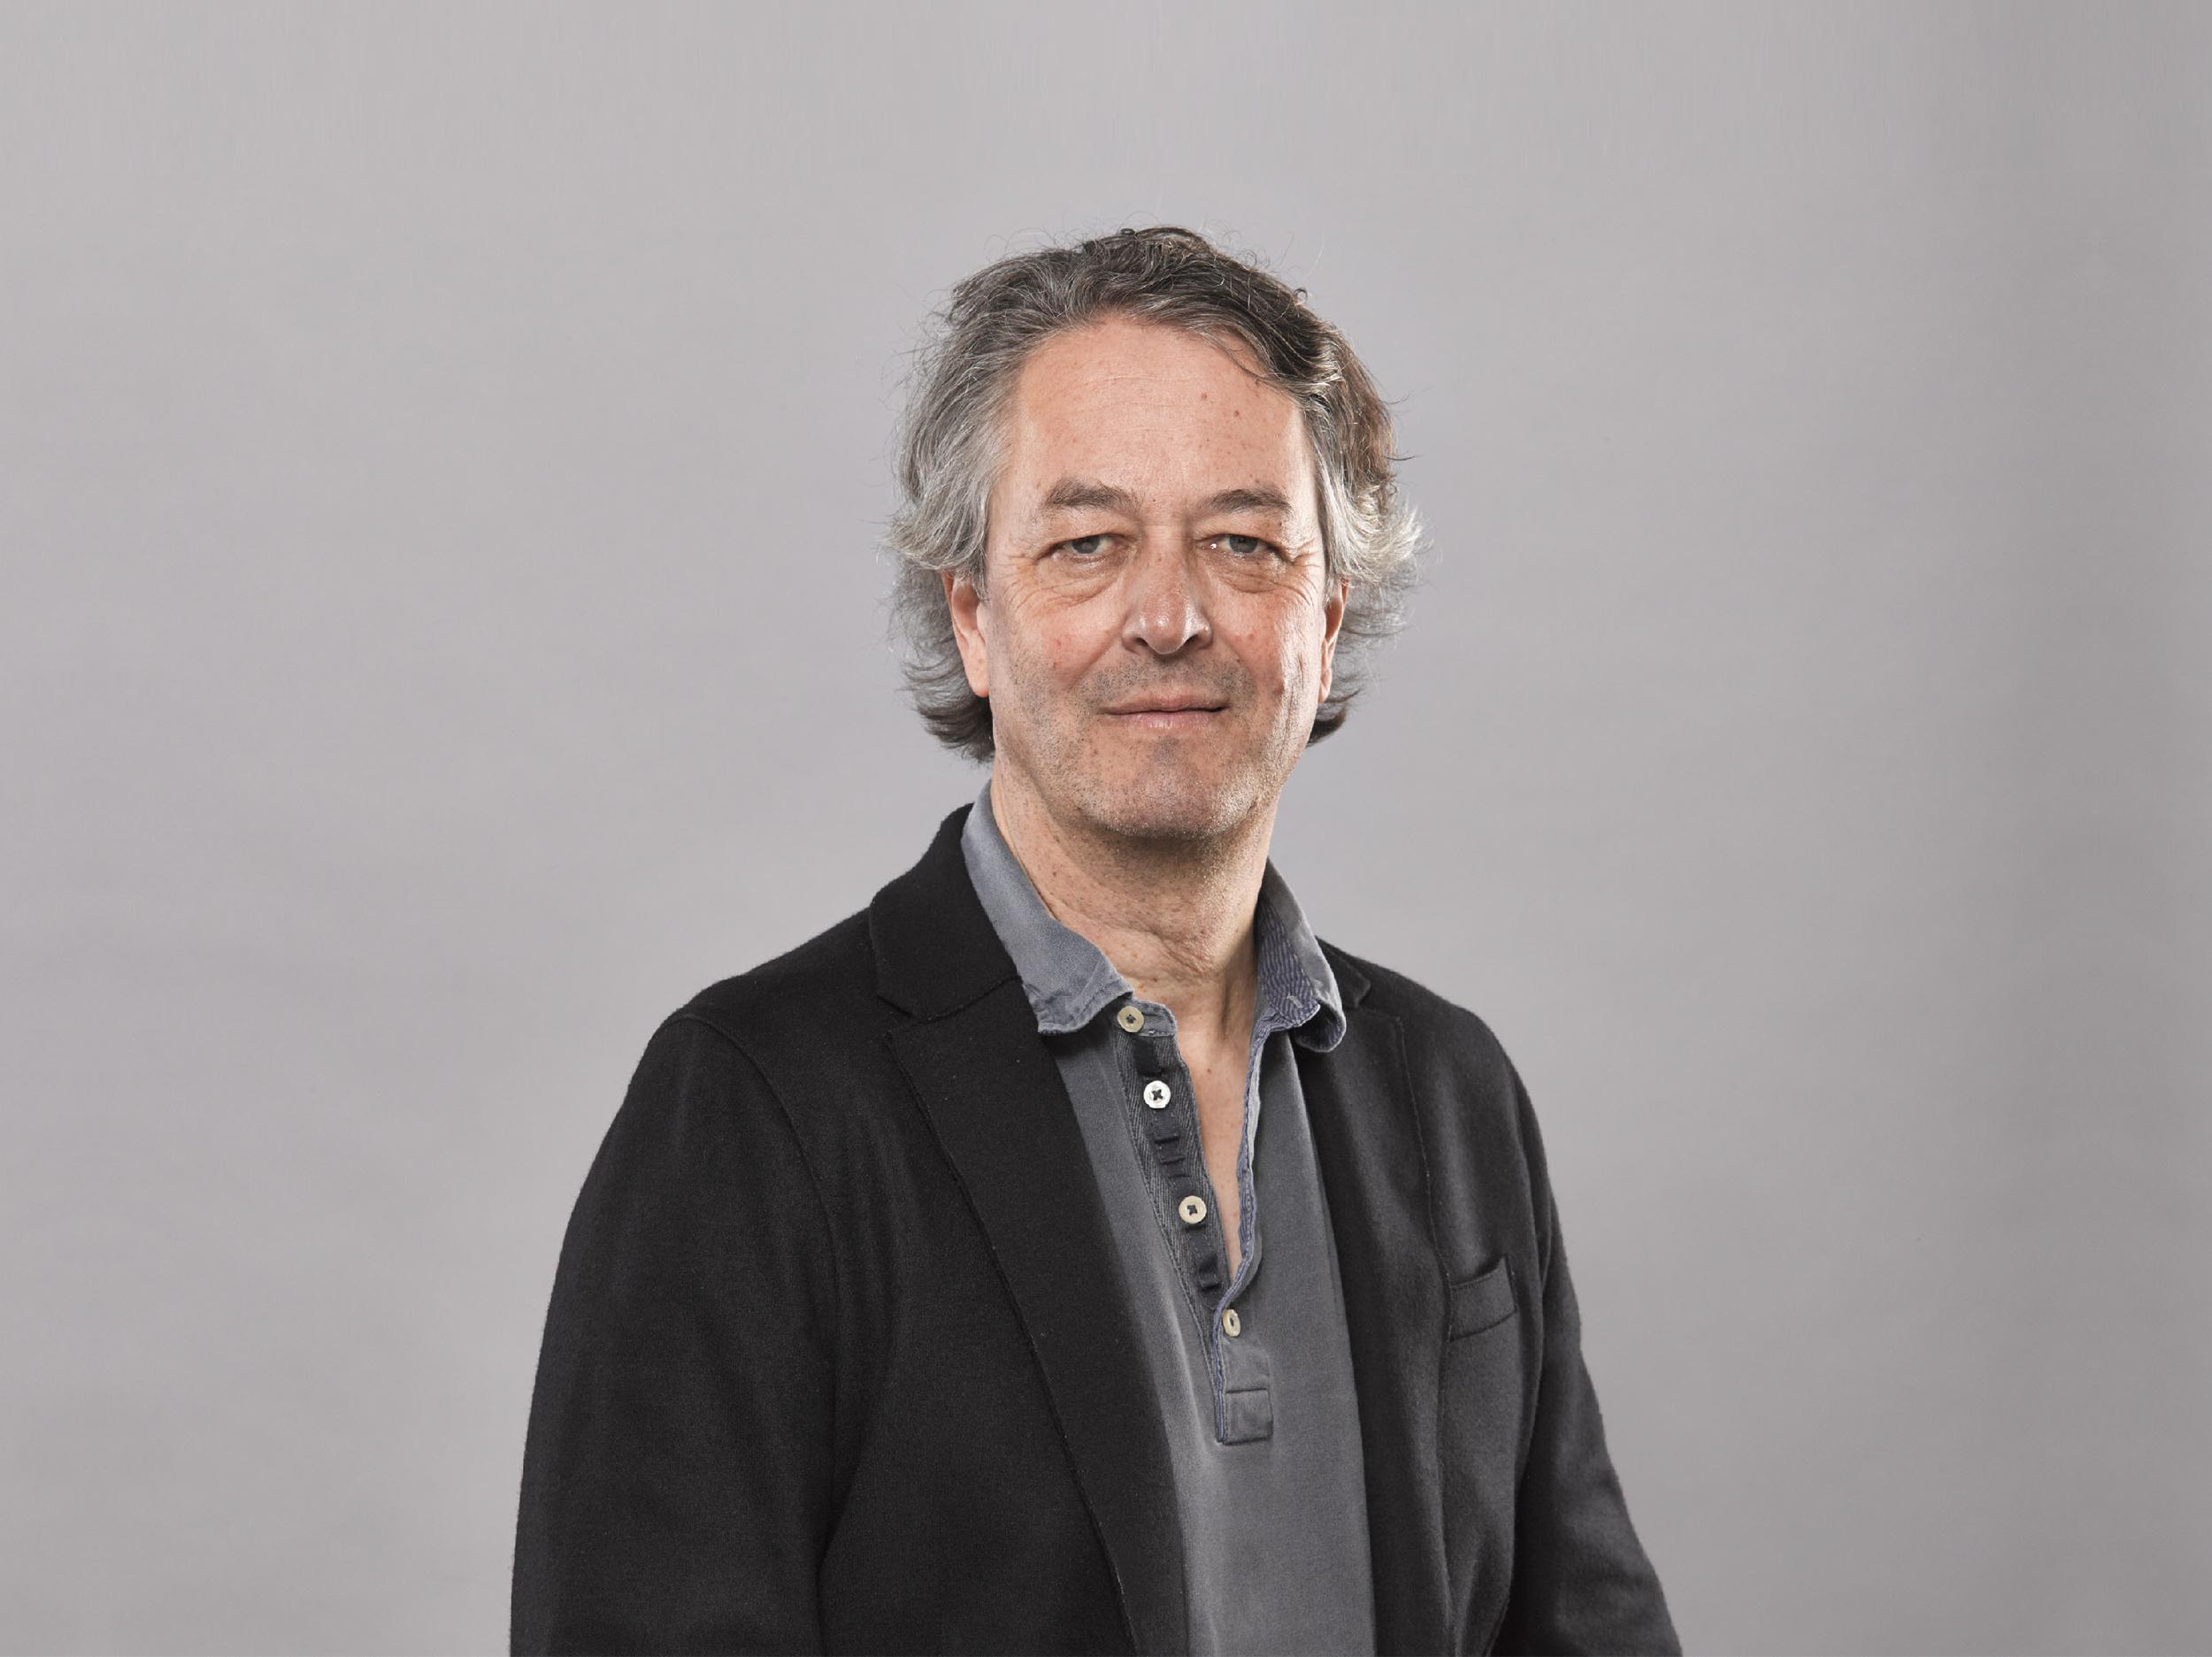 Prof. Björn Bartholdy